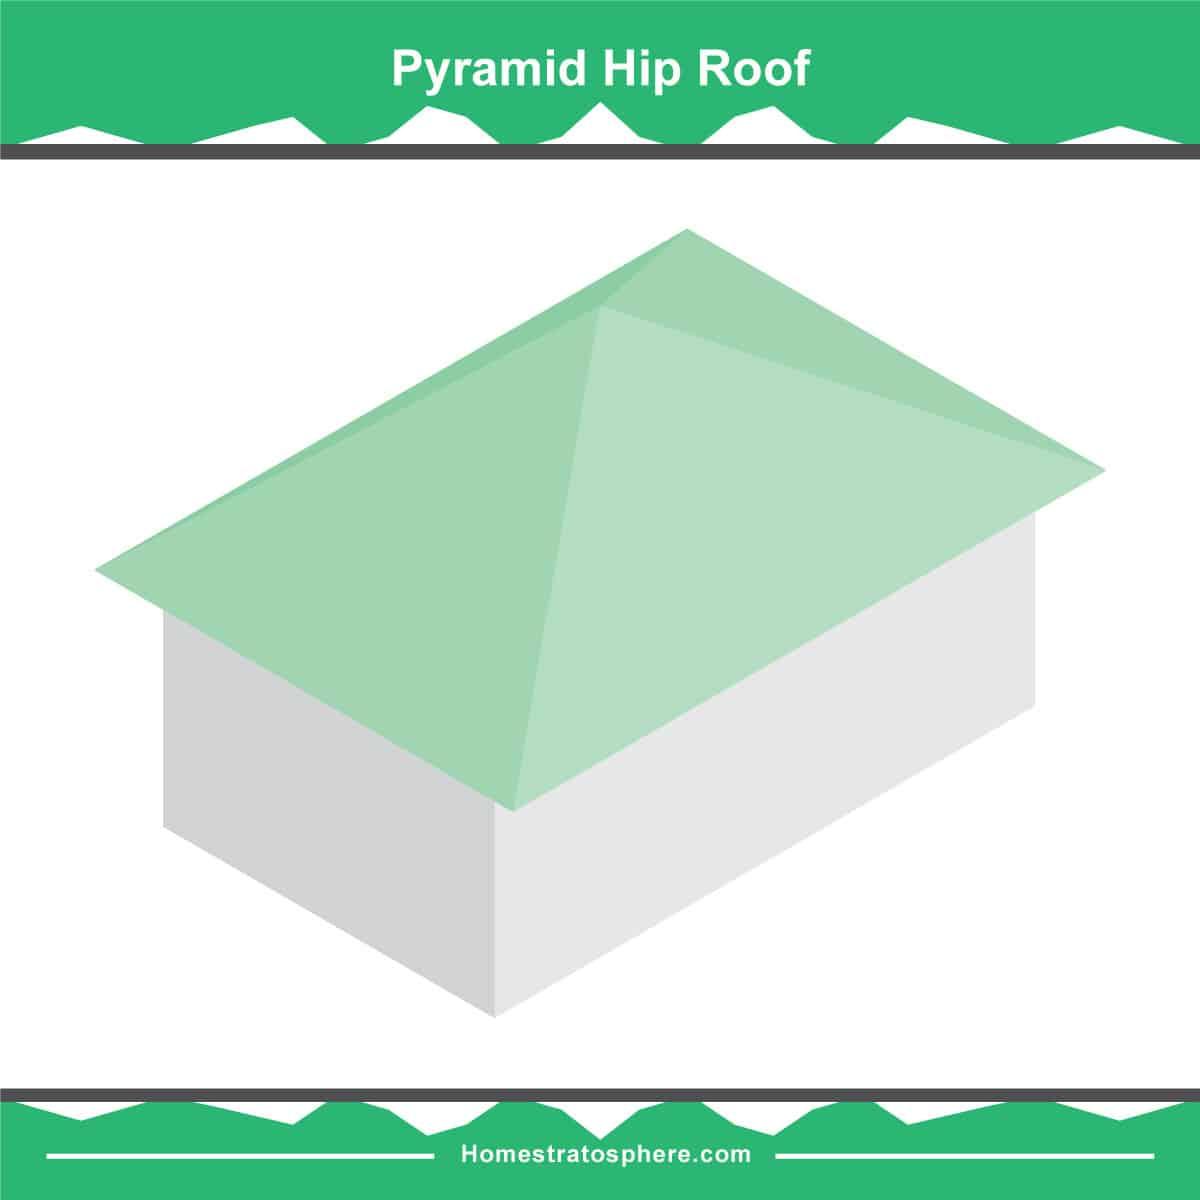 Pyramid hip roof diagram